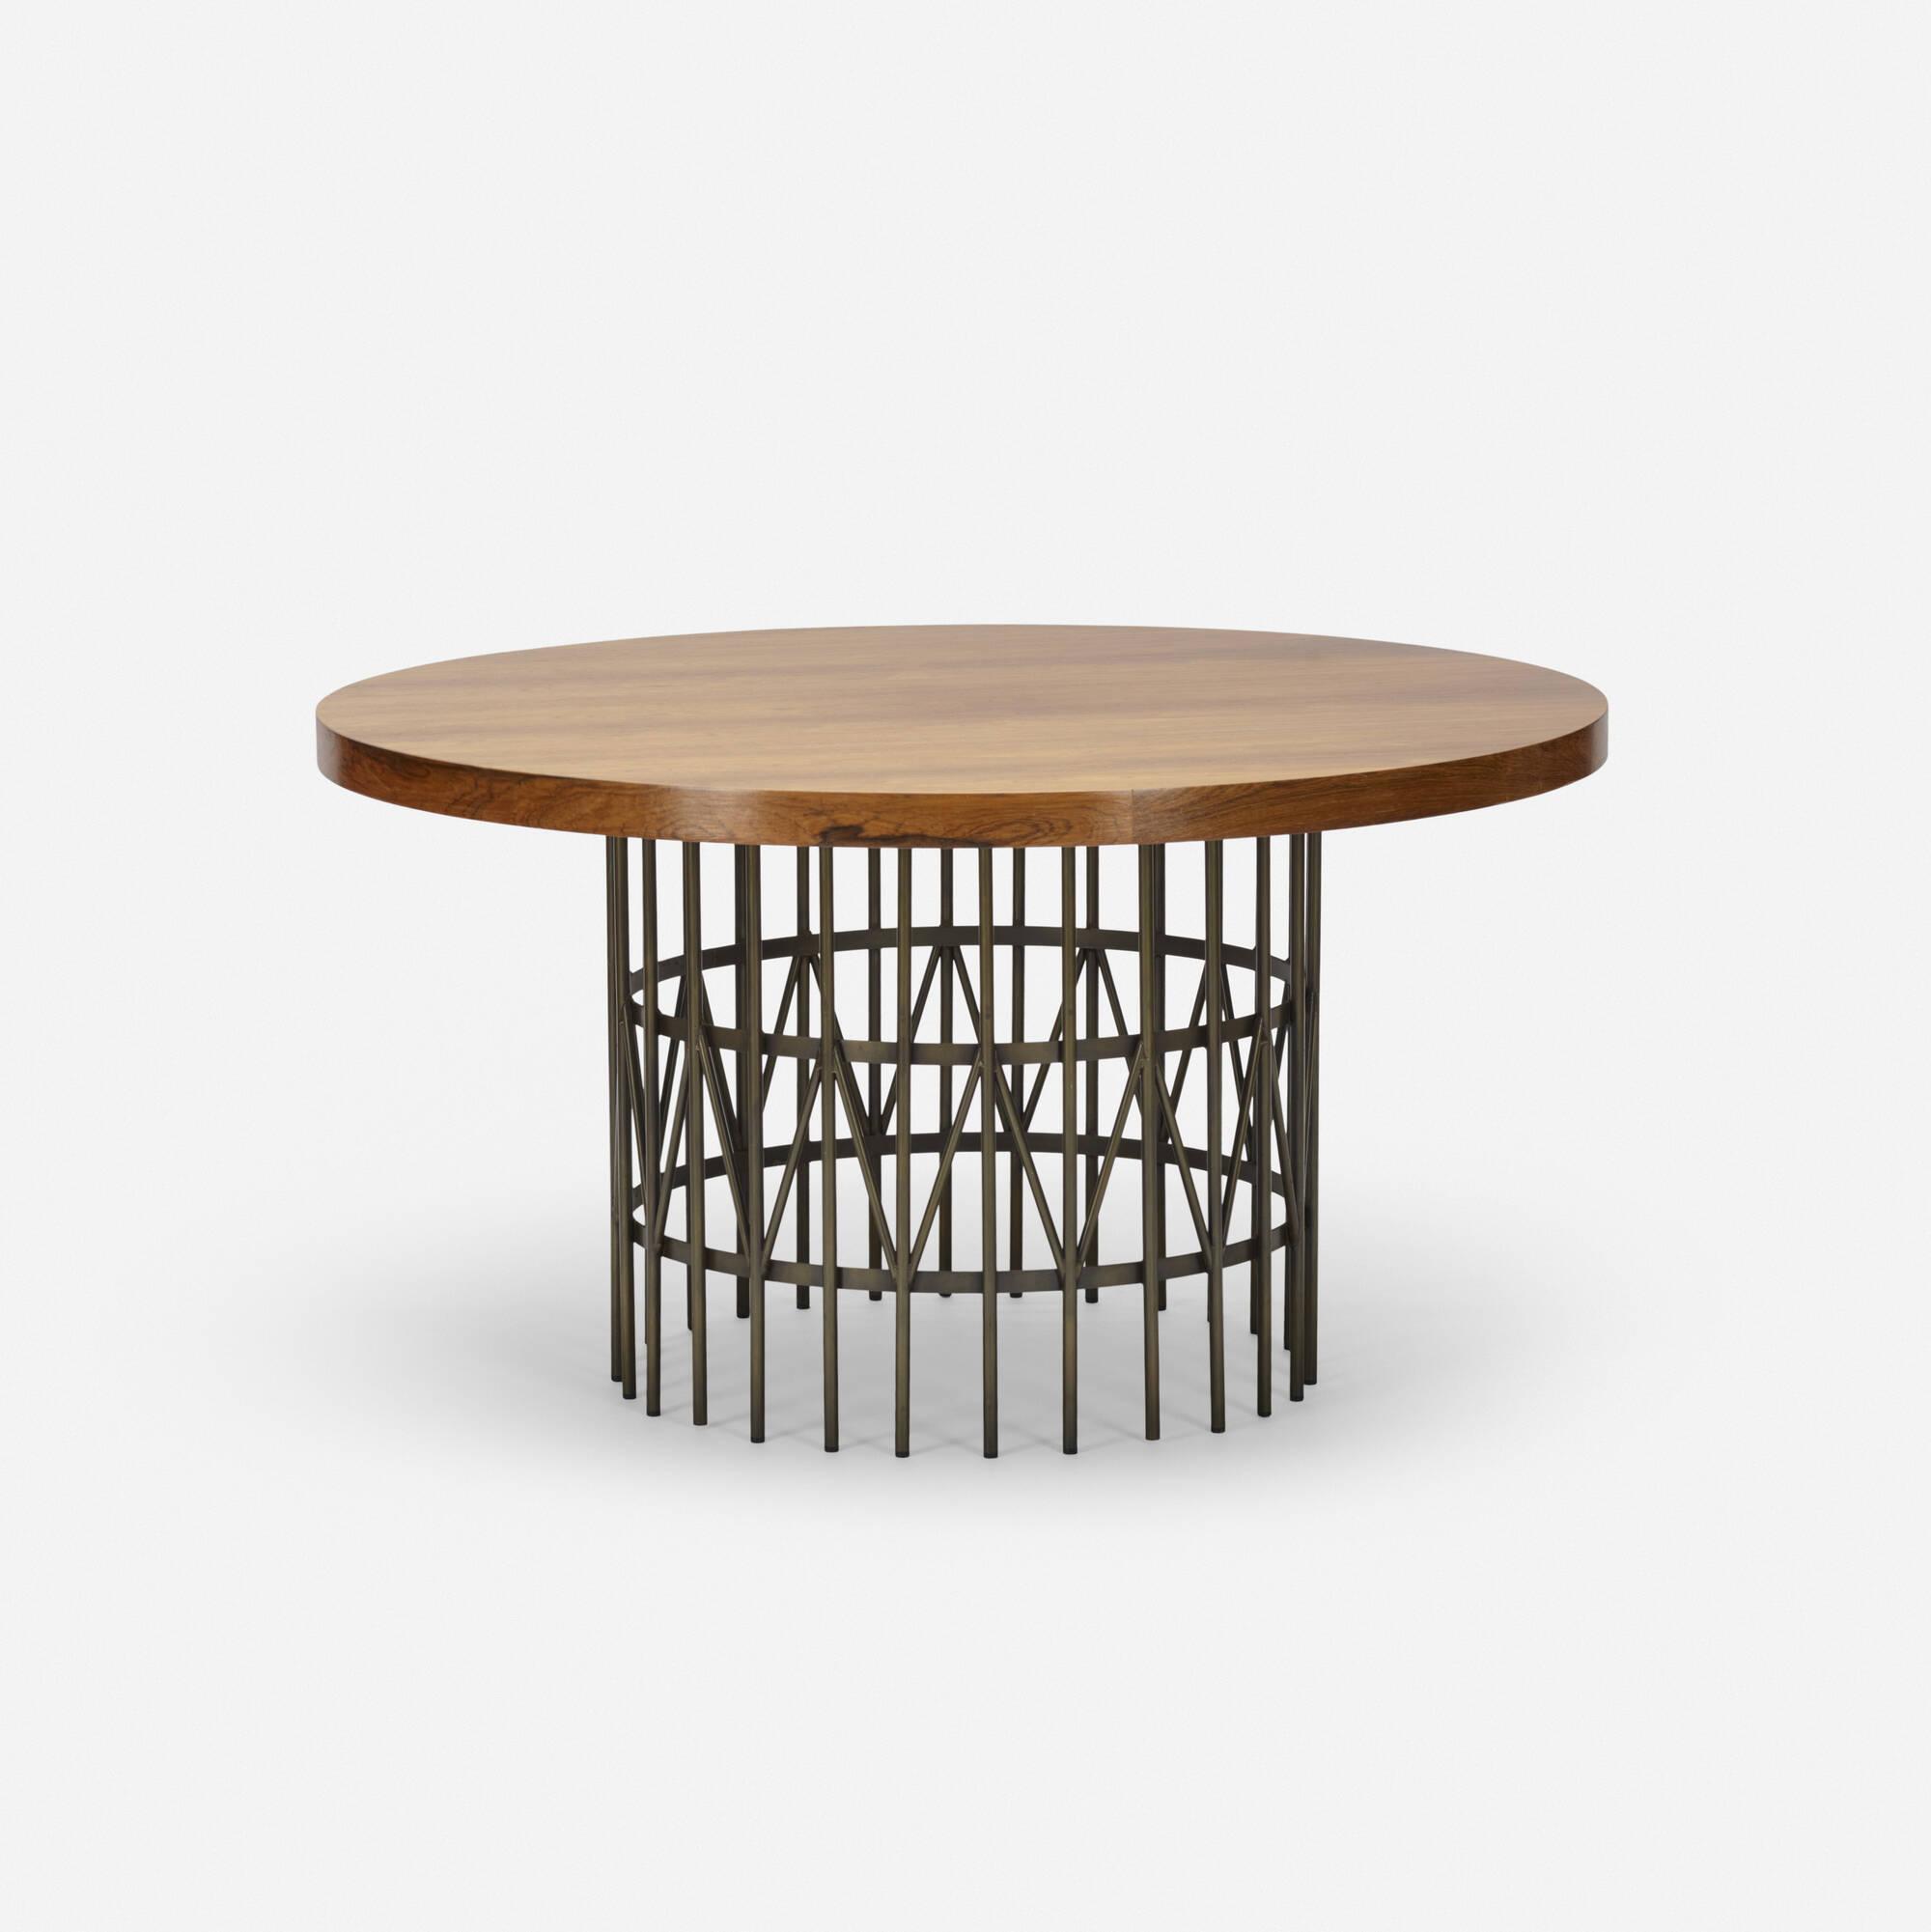 108: Milo Baughman / coffee table (1 of 3)